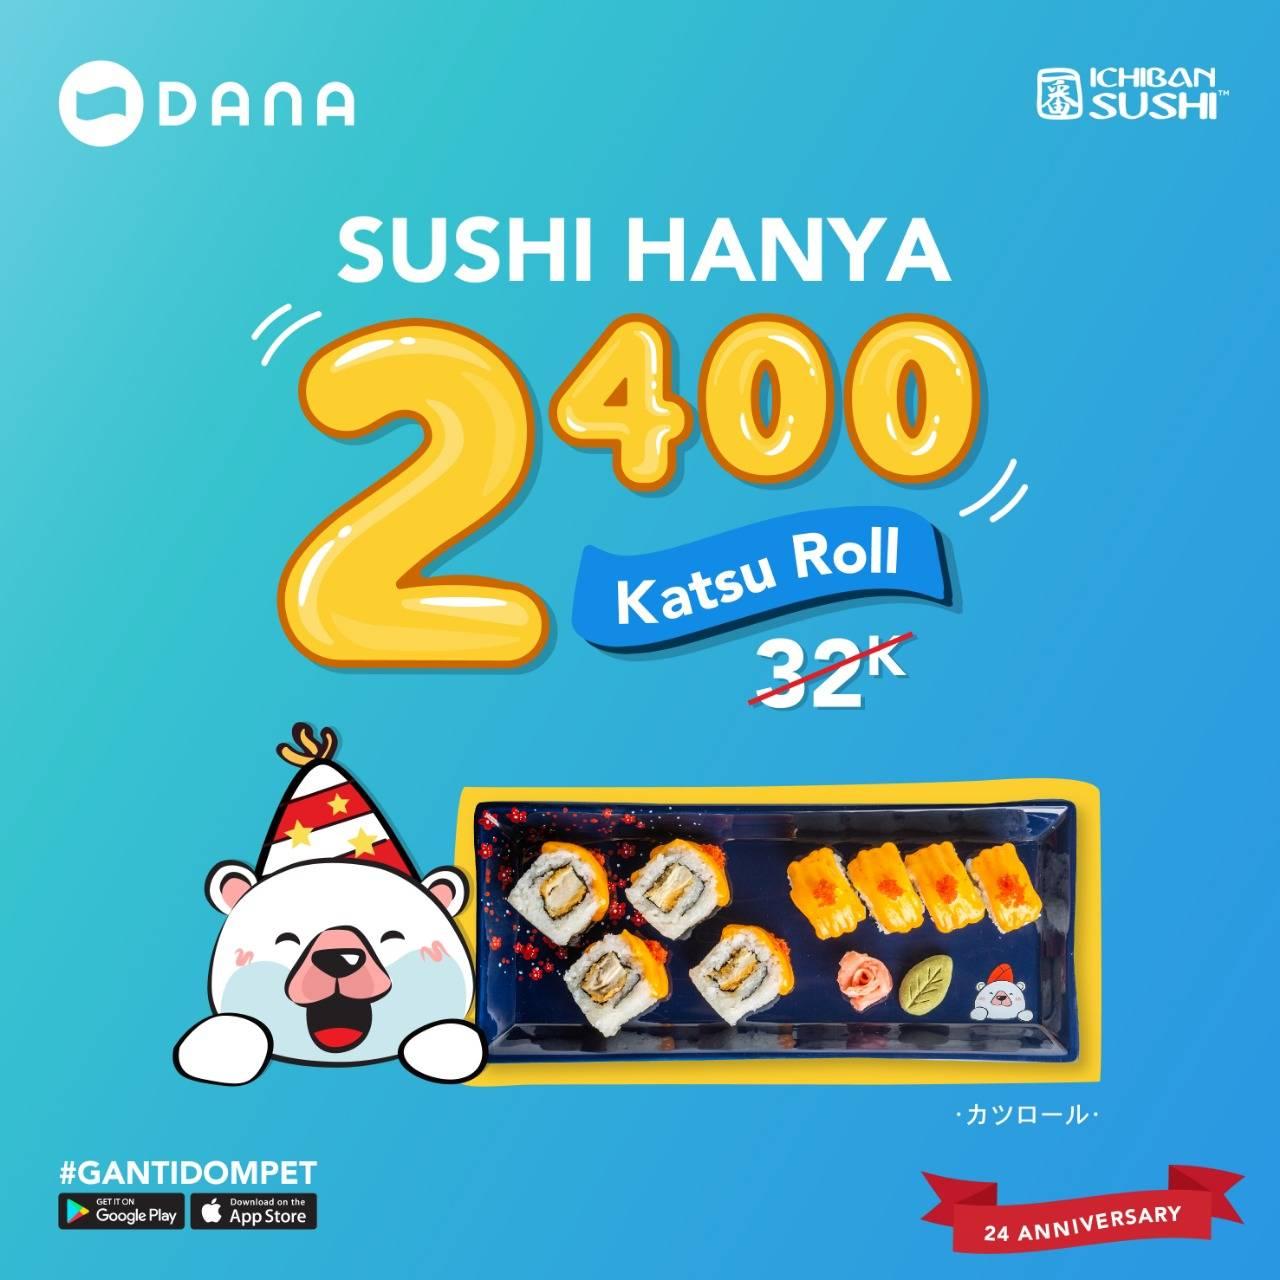 Ichiban Sushi Promo Harga Spesial Katsu Roll cuma Rp. 2.400 dengan Dana